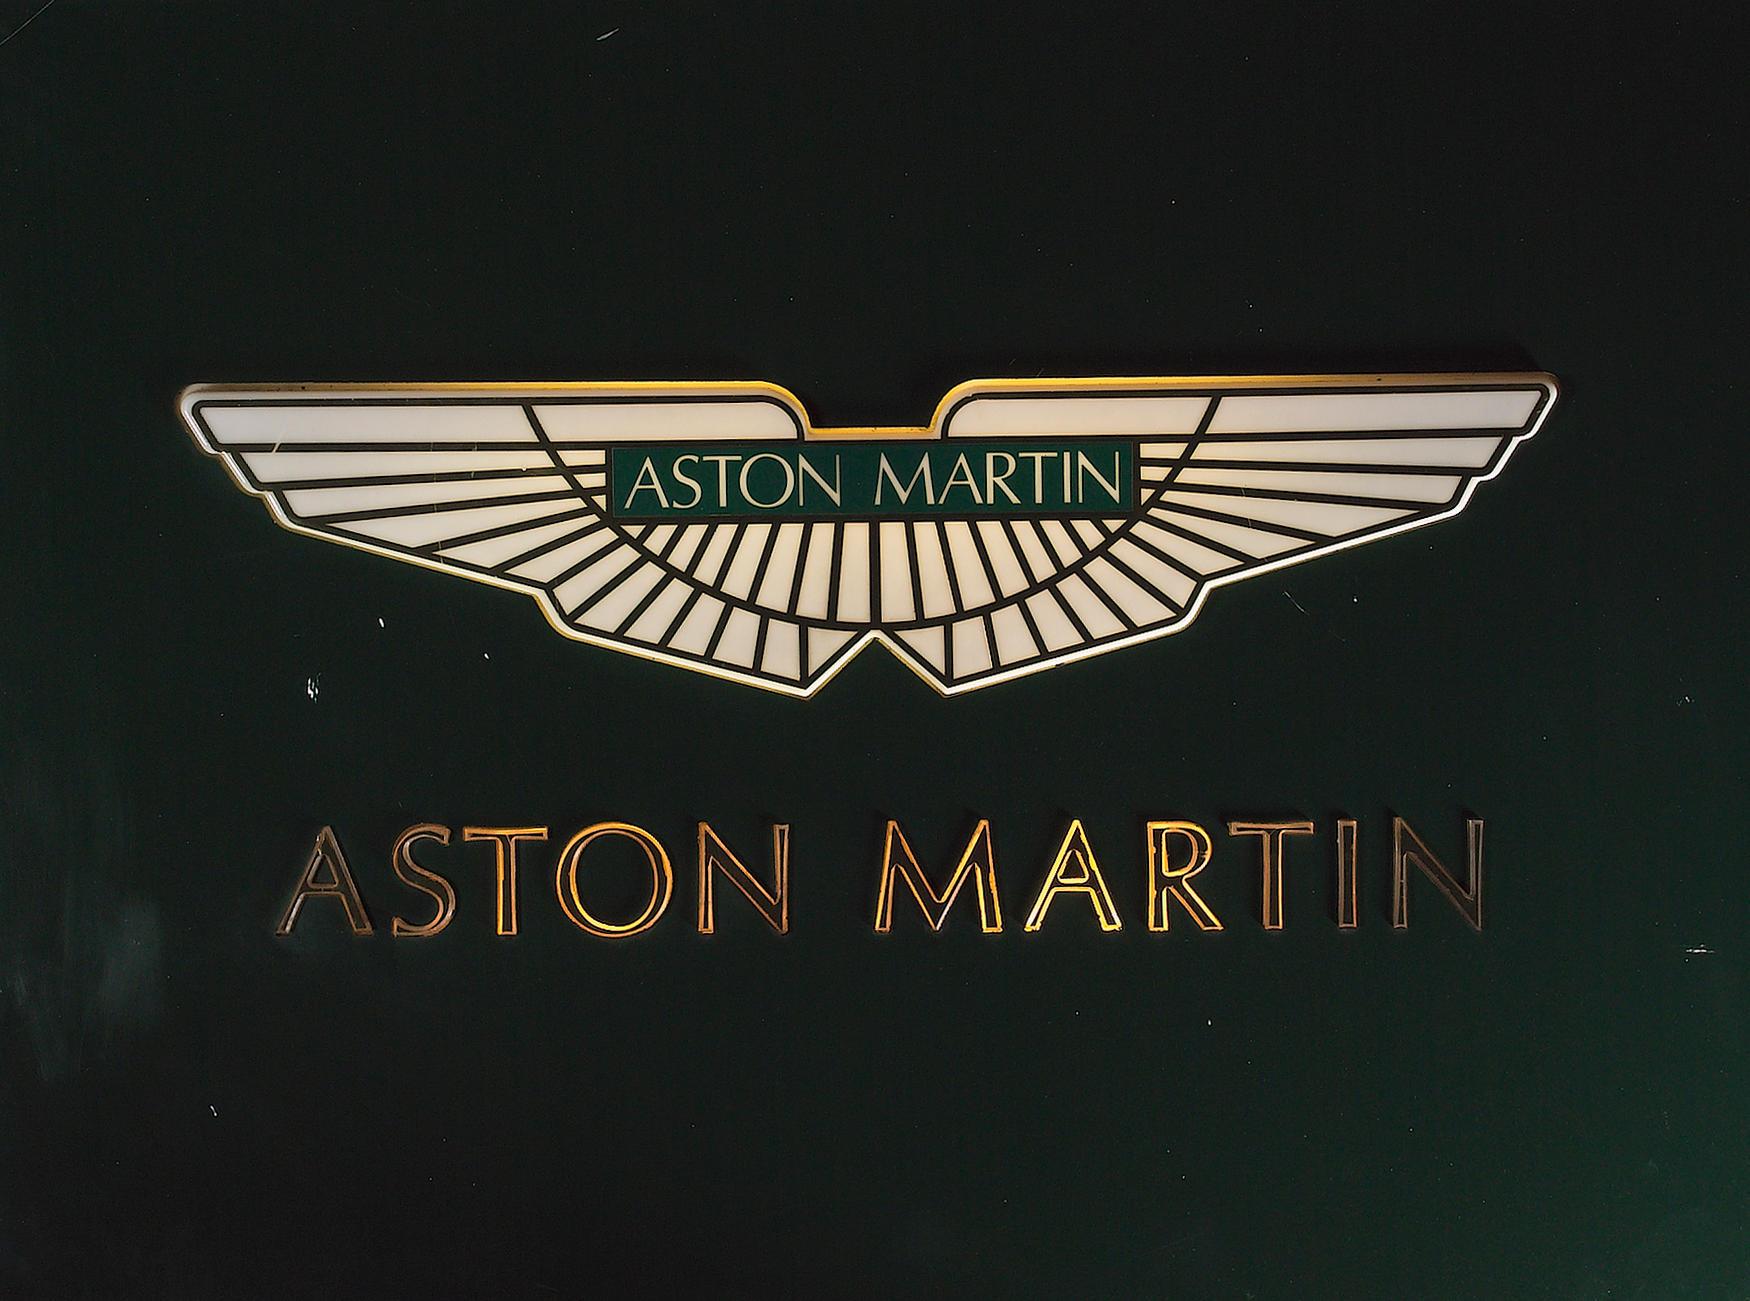 Aston Martin Racing oval sign